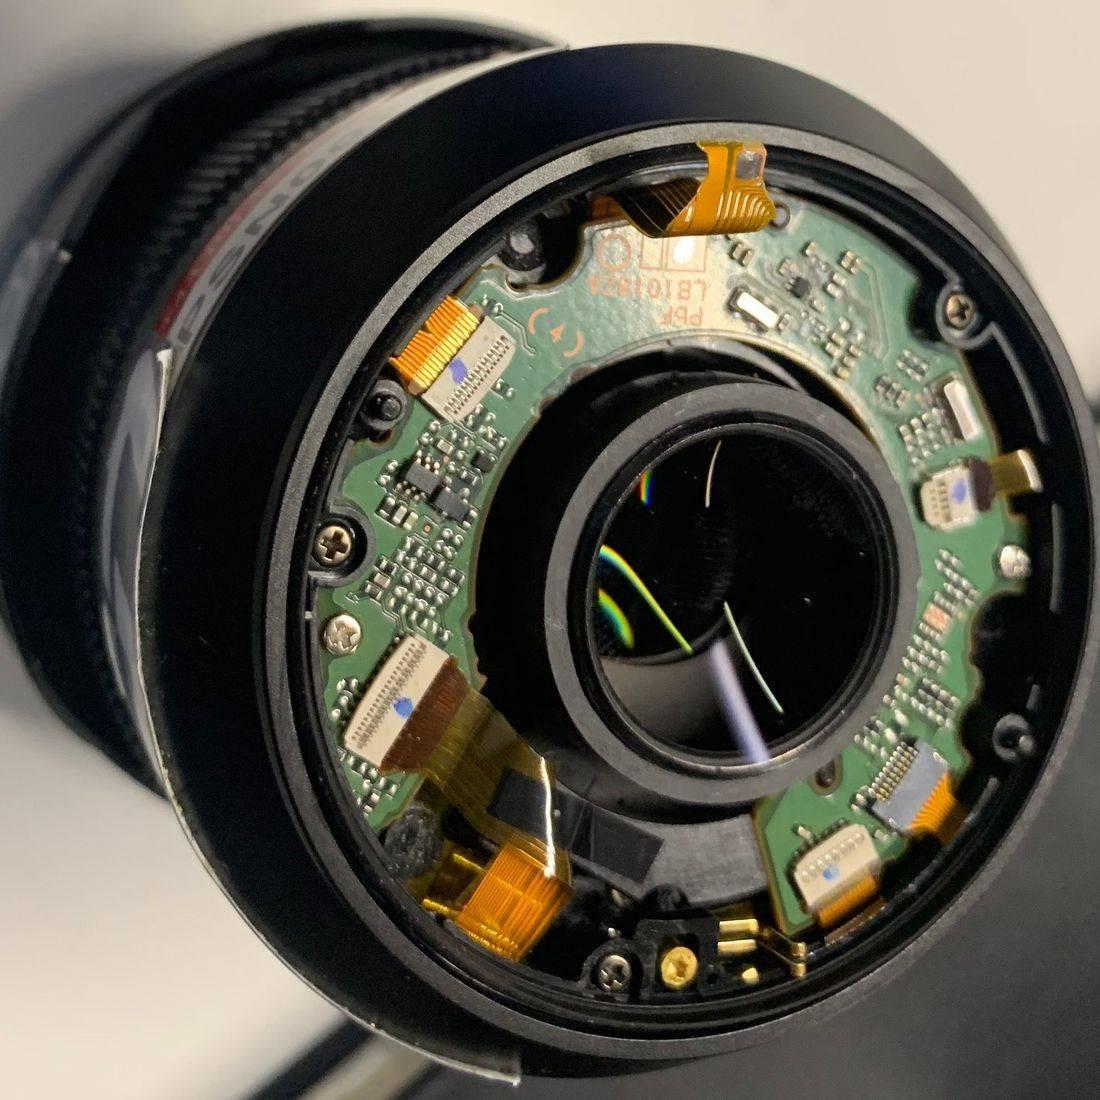 Panasonic Leica 12-60mm f/2.8-4 ASPH. POWER O.I.S.